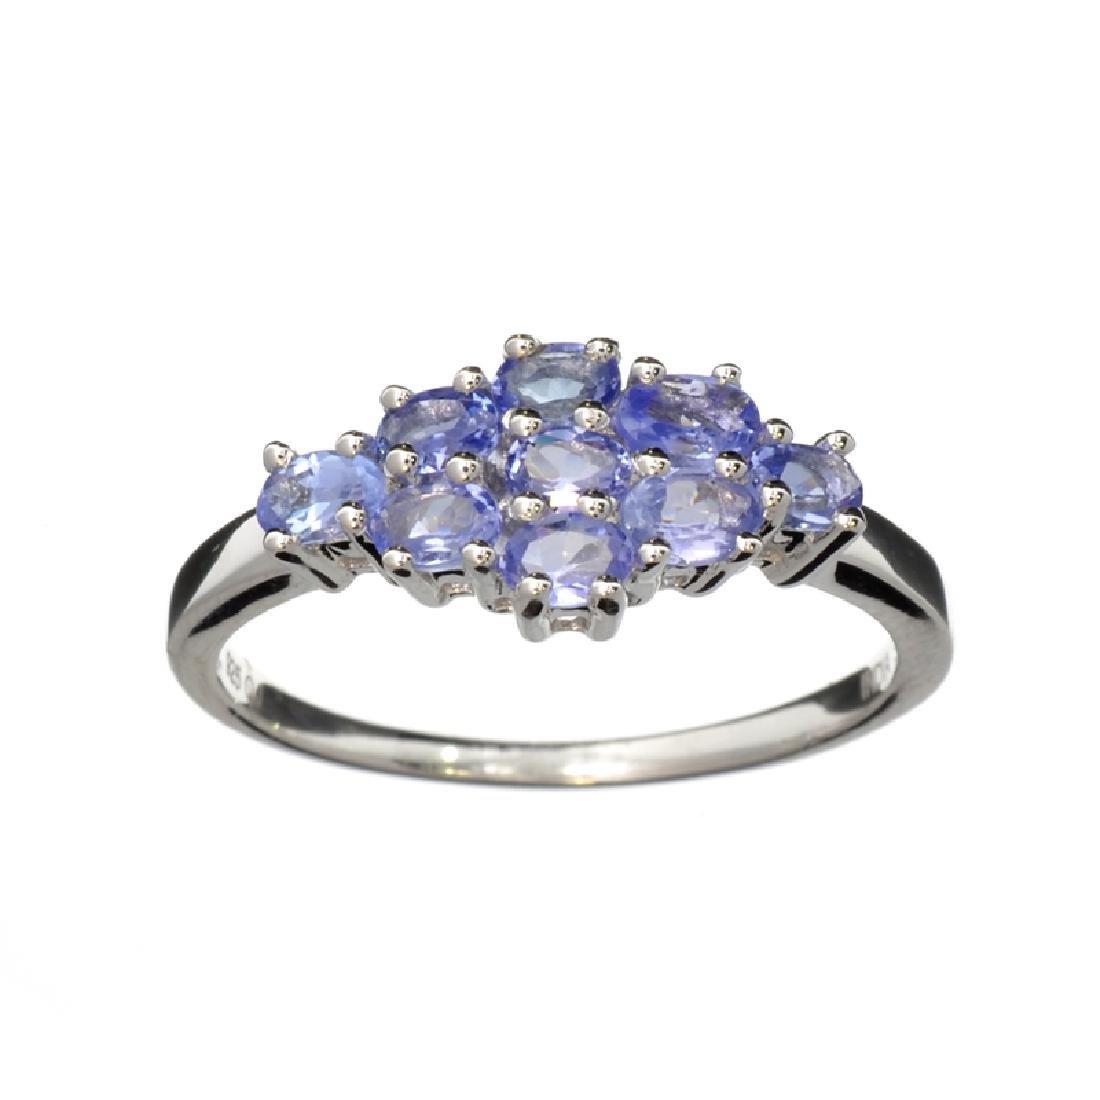 Fine Jewelry 3.00CT Oval Cut Almandite Garnet And